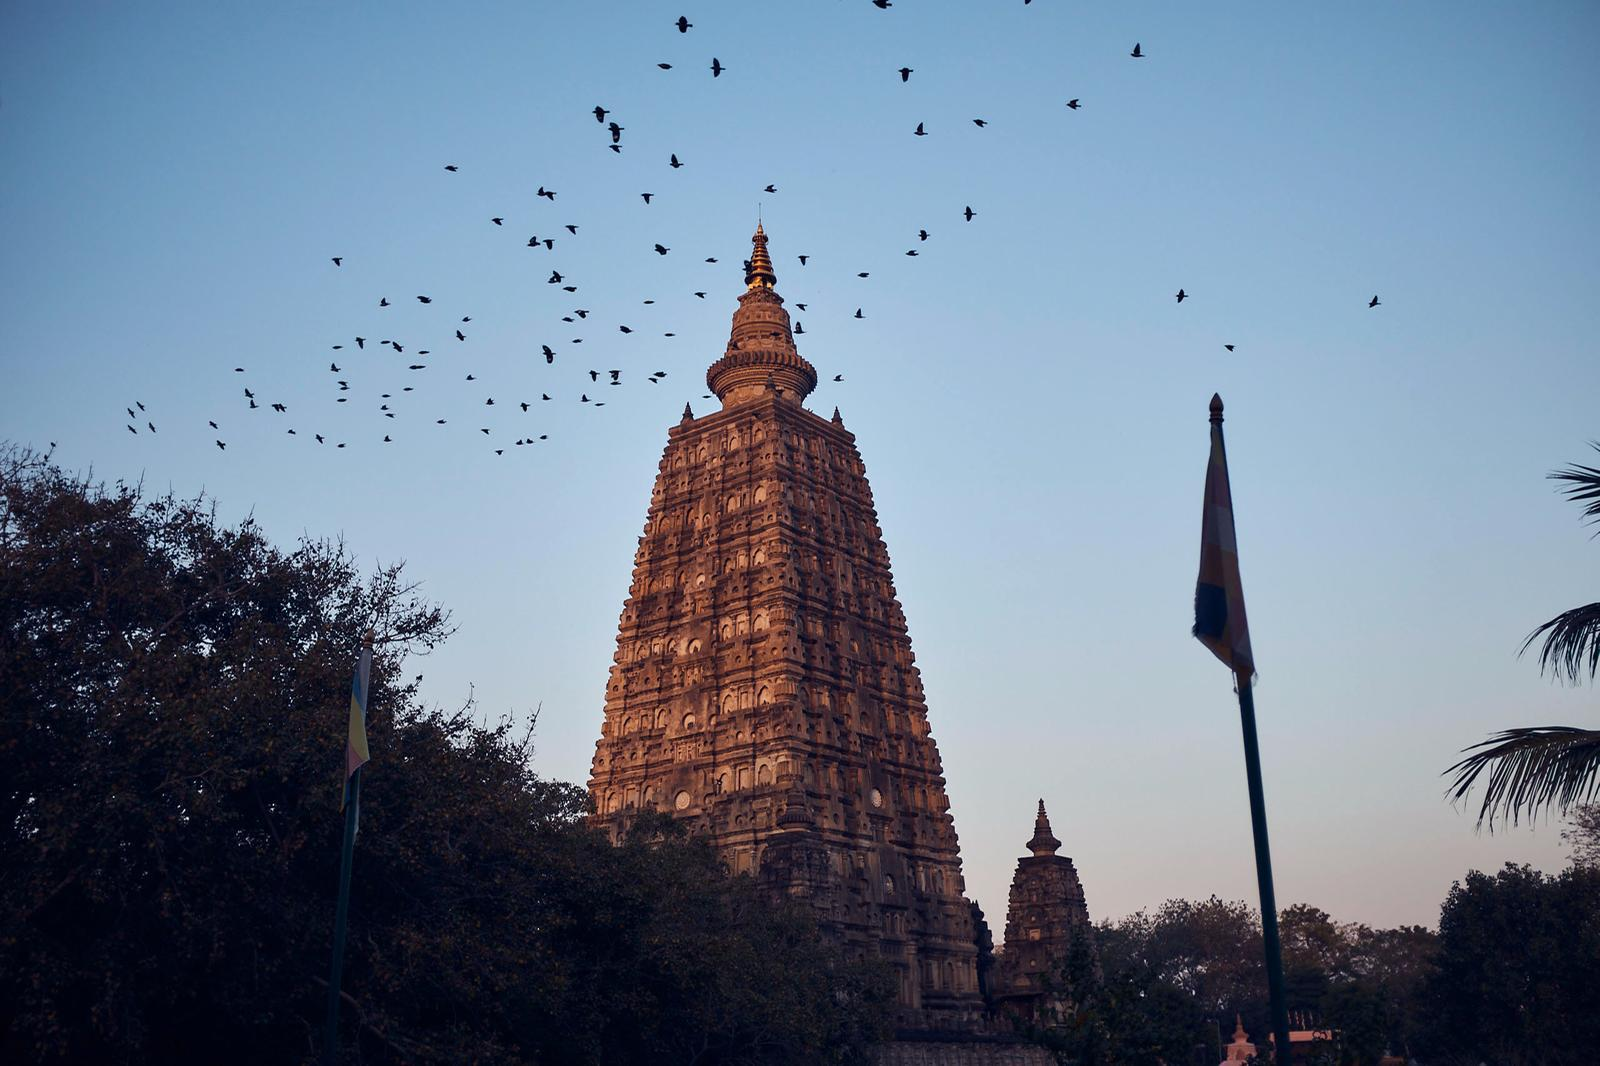 Mahabodhi-Tempel. Rigpa Gebetsfest, März 2019, Bodhgaya (Indien)